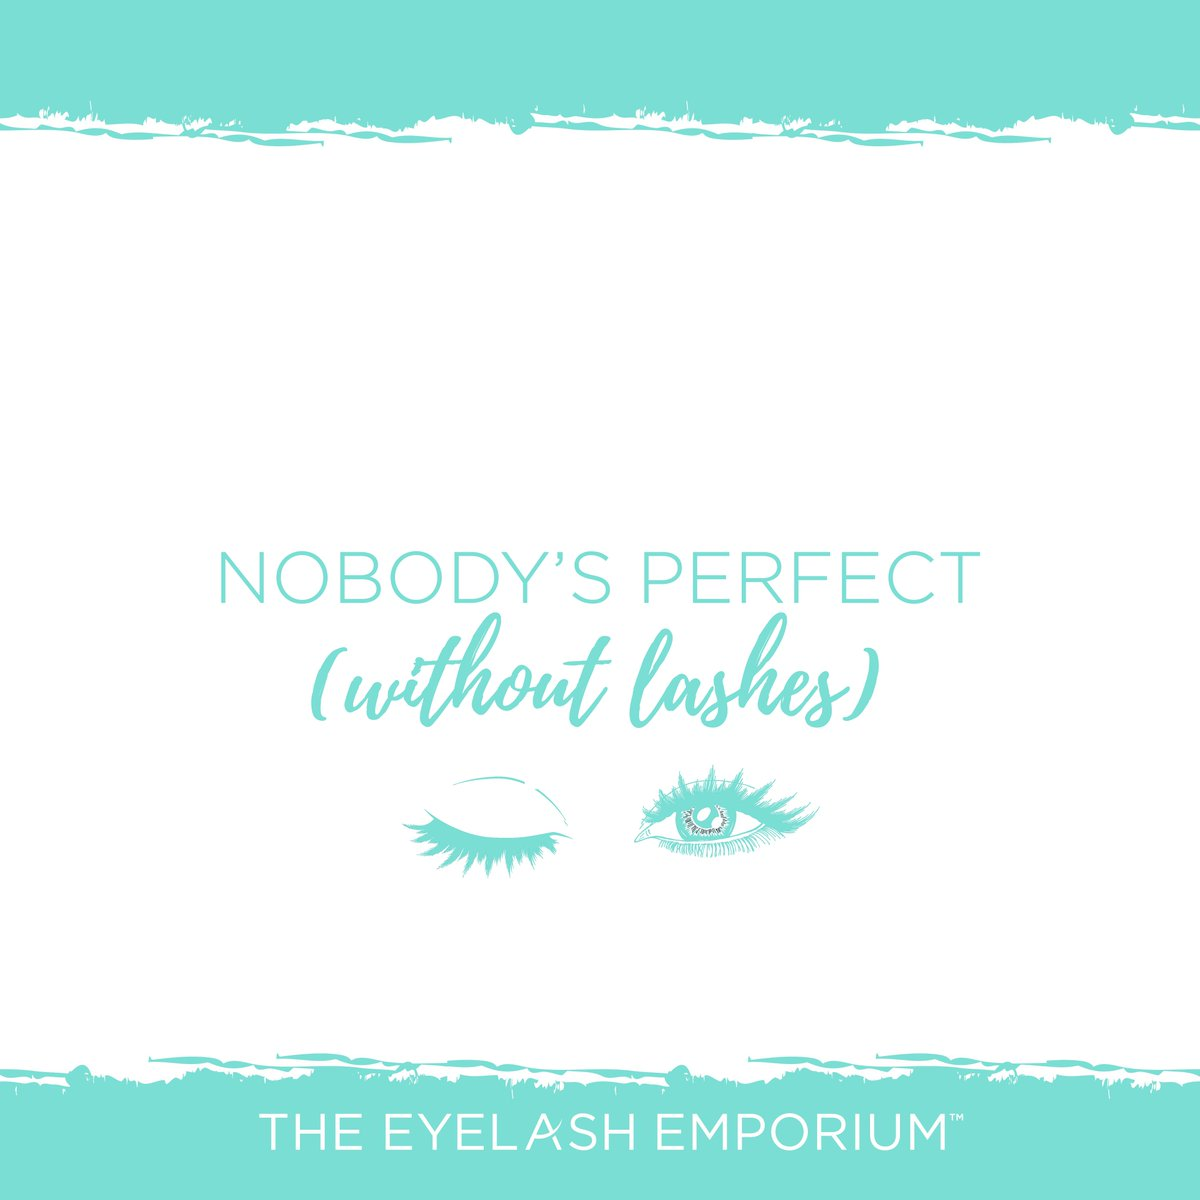 Eyelash Emporium Eyelashemporium Twitter